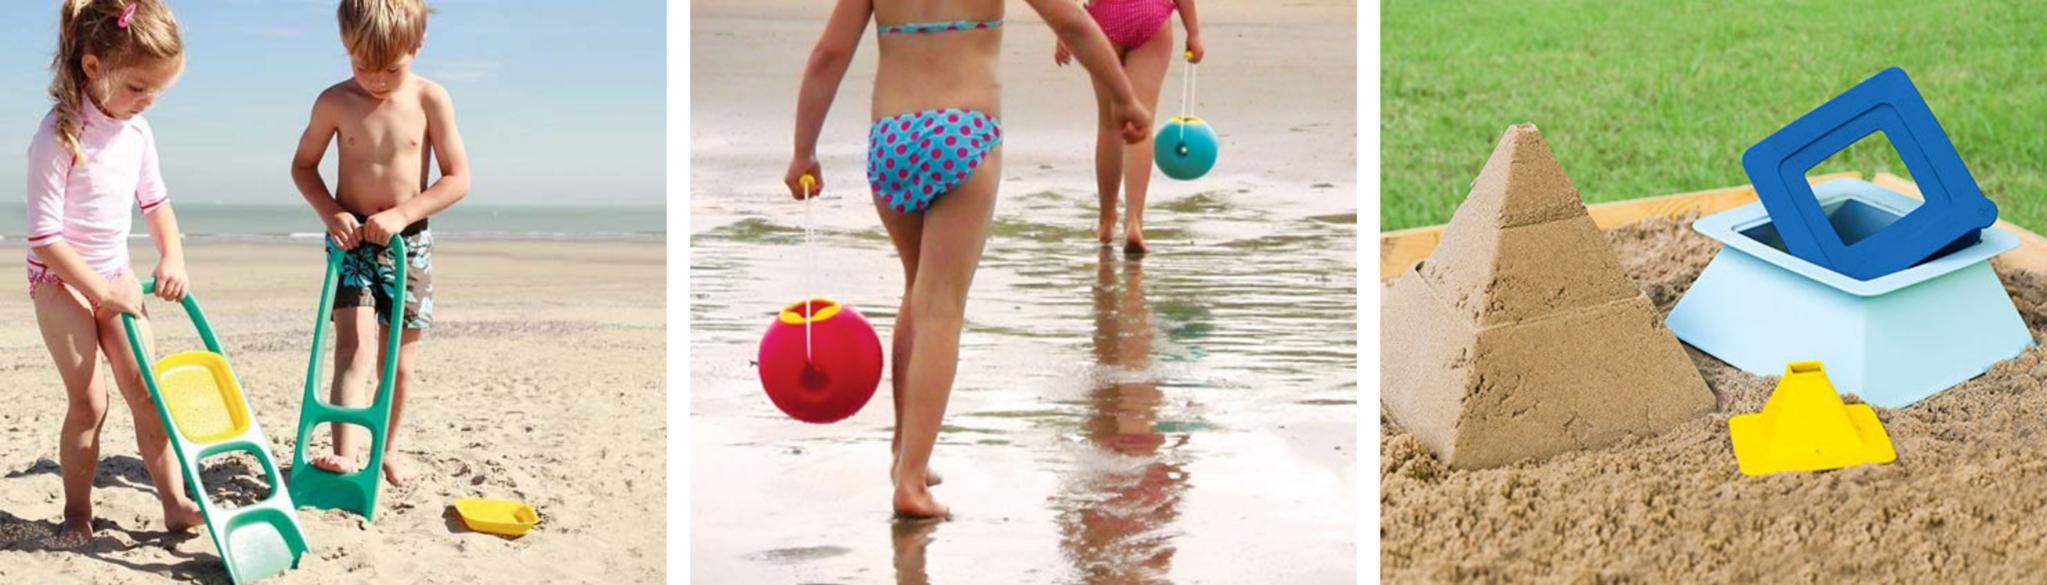 Quut Strandspeelgoed